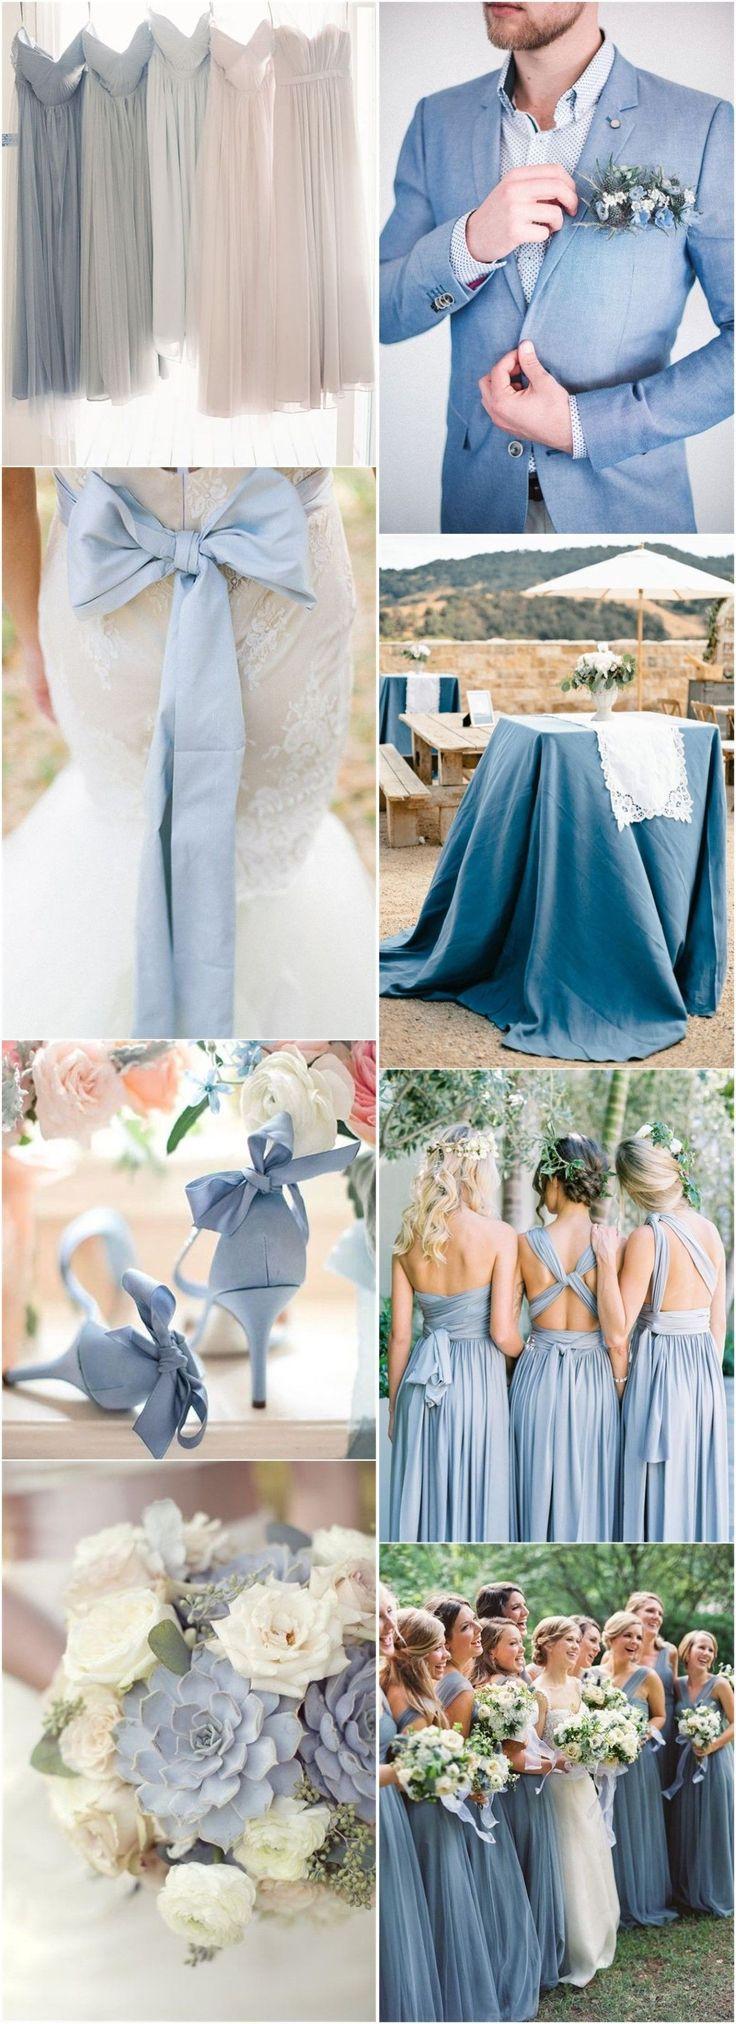 Wedding Colors » 2017 Wedding Inspiration: Dusty Blue Wedding Color Ideas » ❤️ More: http://www.weddinginclude.com/2017/08/wedding-inspiration-dusty-blue-wedding-color-ideas/